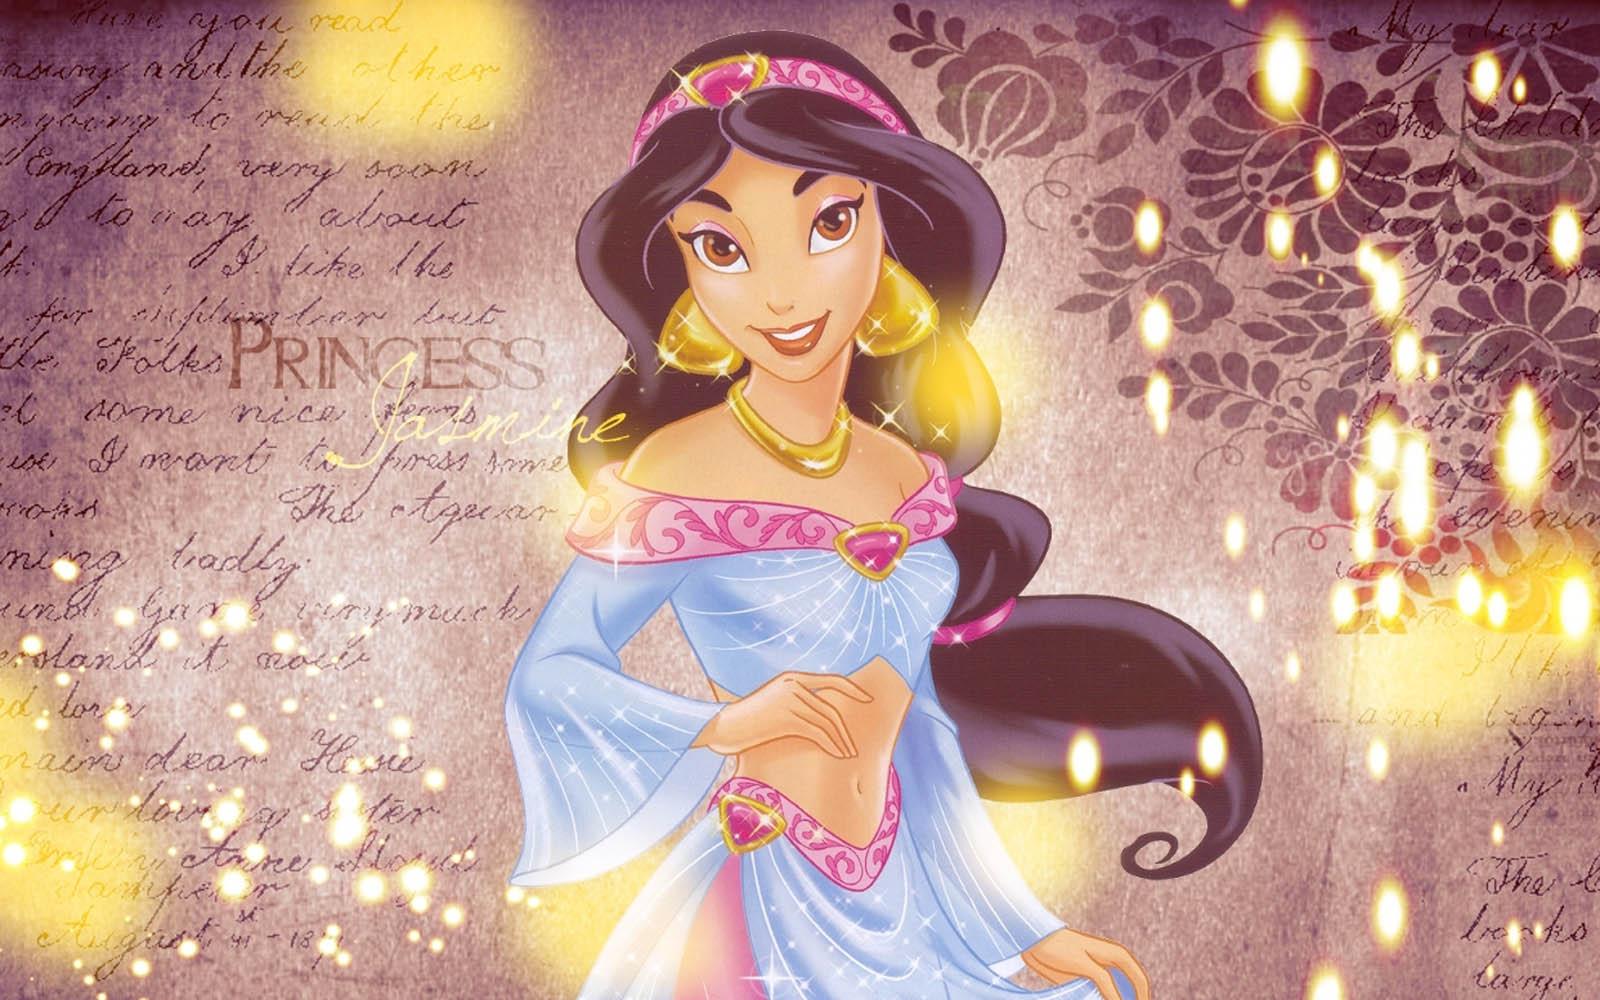 Keywords Disney Princess Jasmine Wallpapers Disney Princess Jasmine 1600x1000